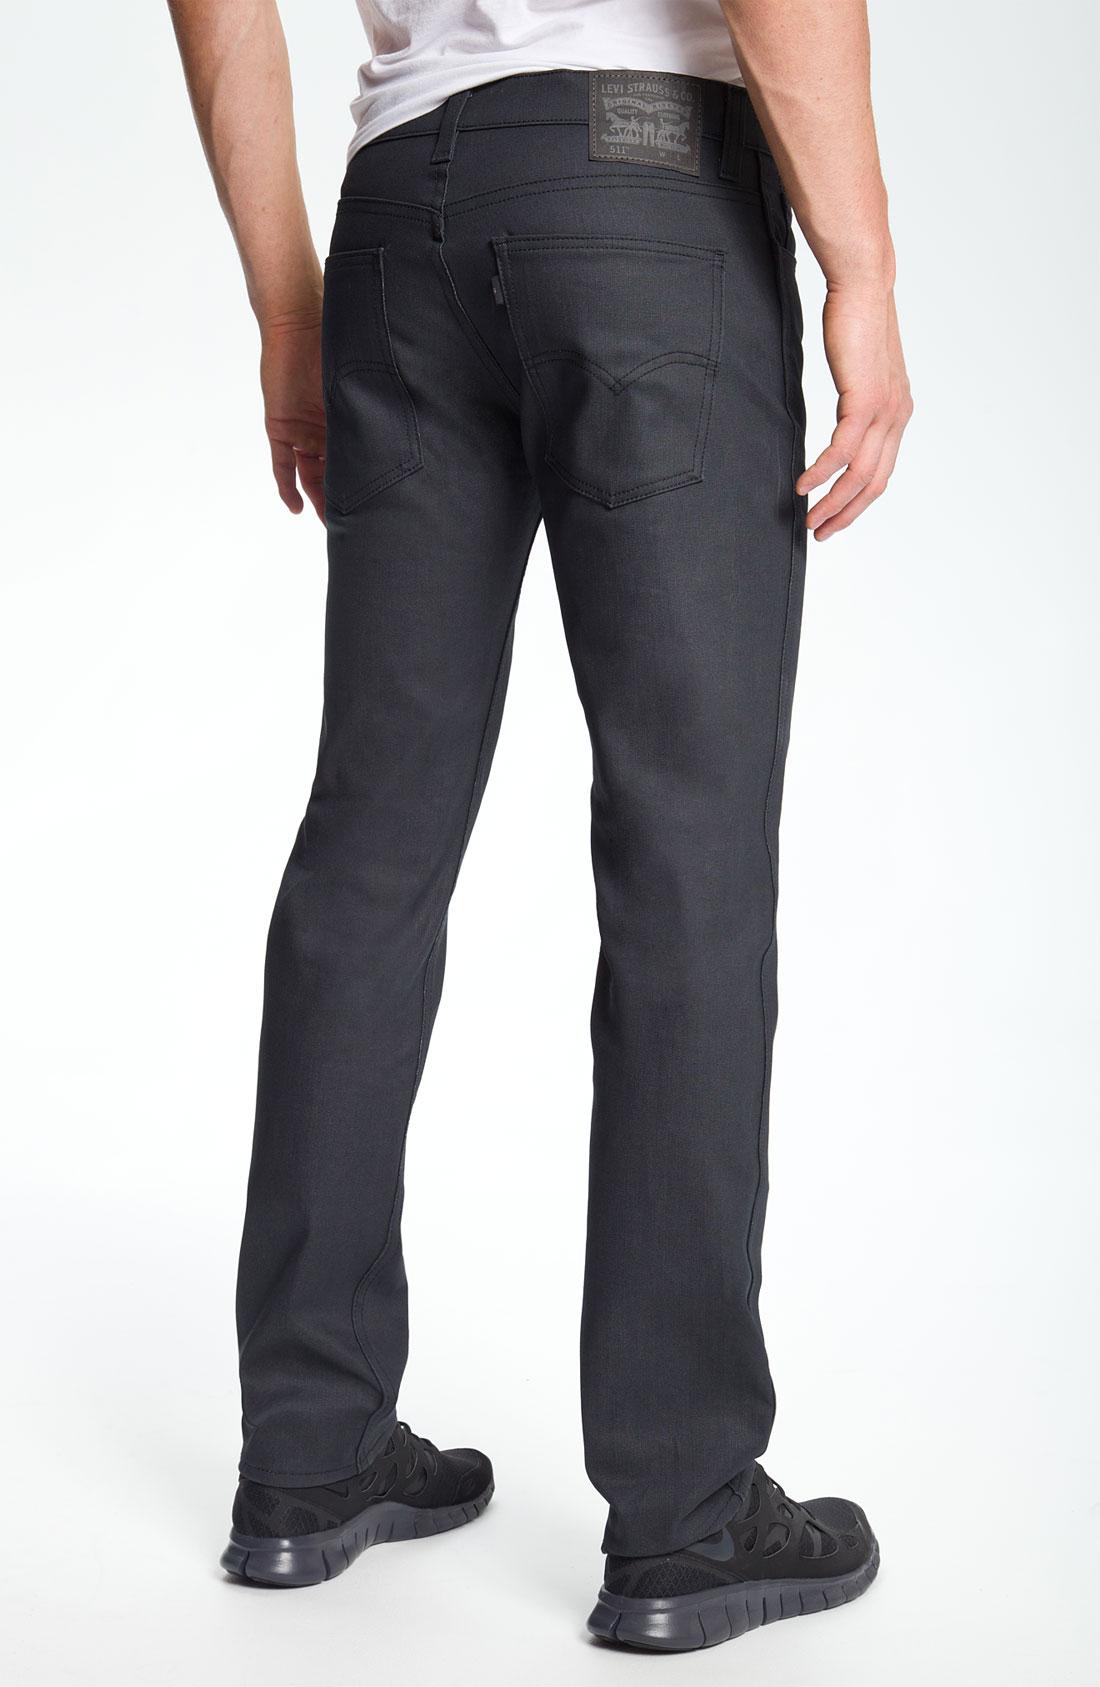 levi 39 s 511 slim fit jeans in gray for men anthracite lyst. Black Bedroom Furniture Sets. Home Design Ideas